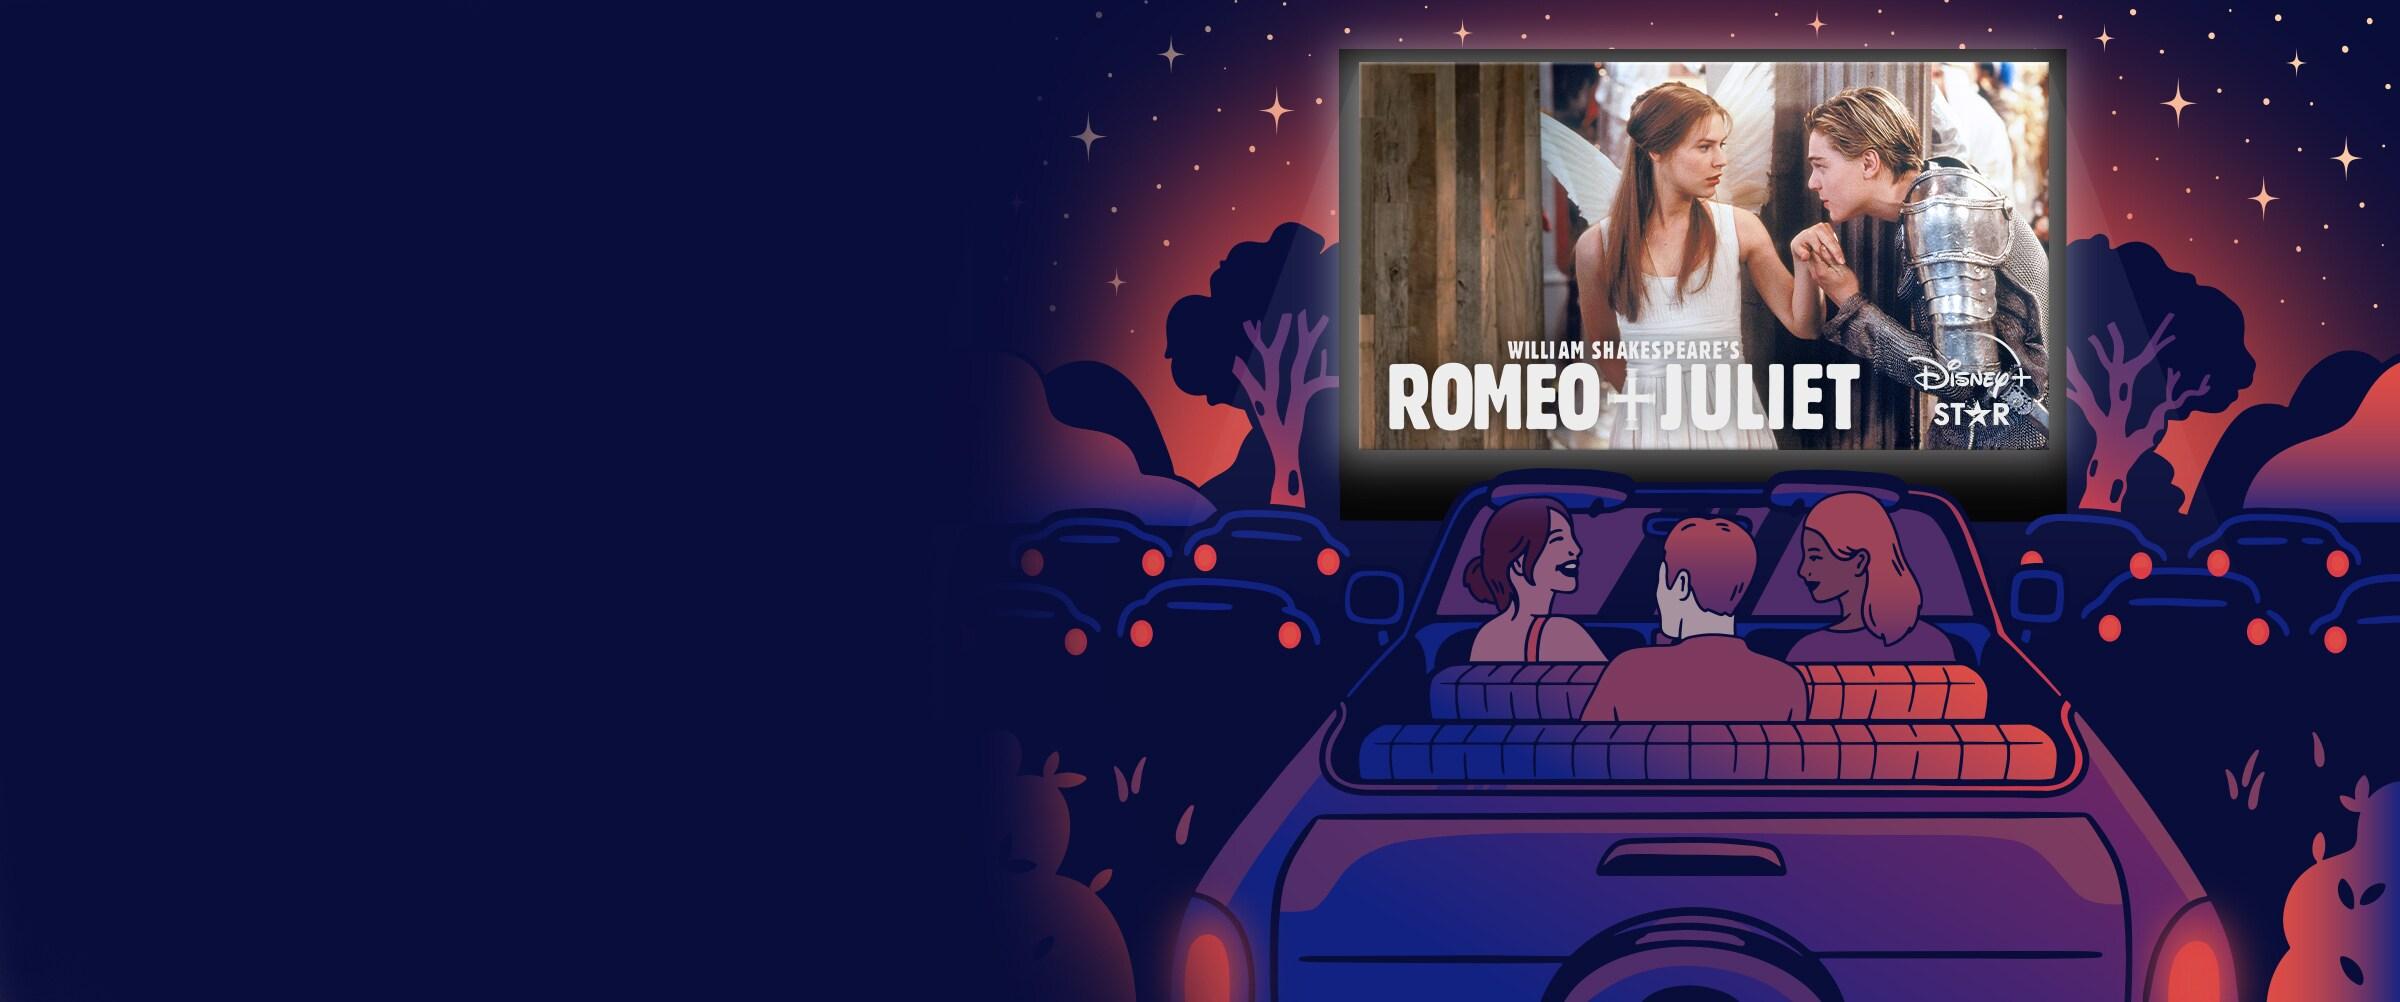 Star on Disney+ Drive-In | Romeo + Juliet